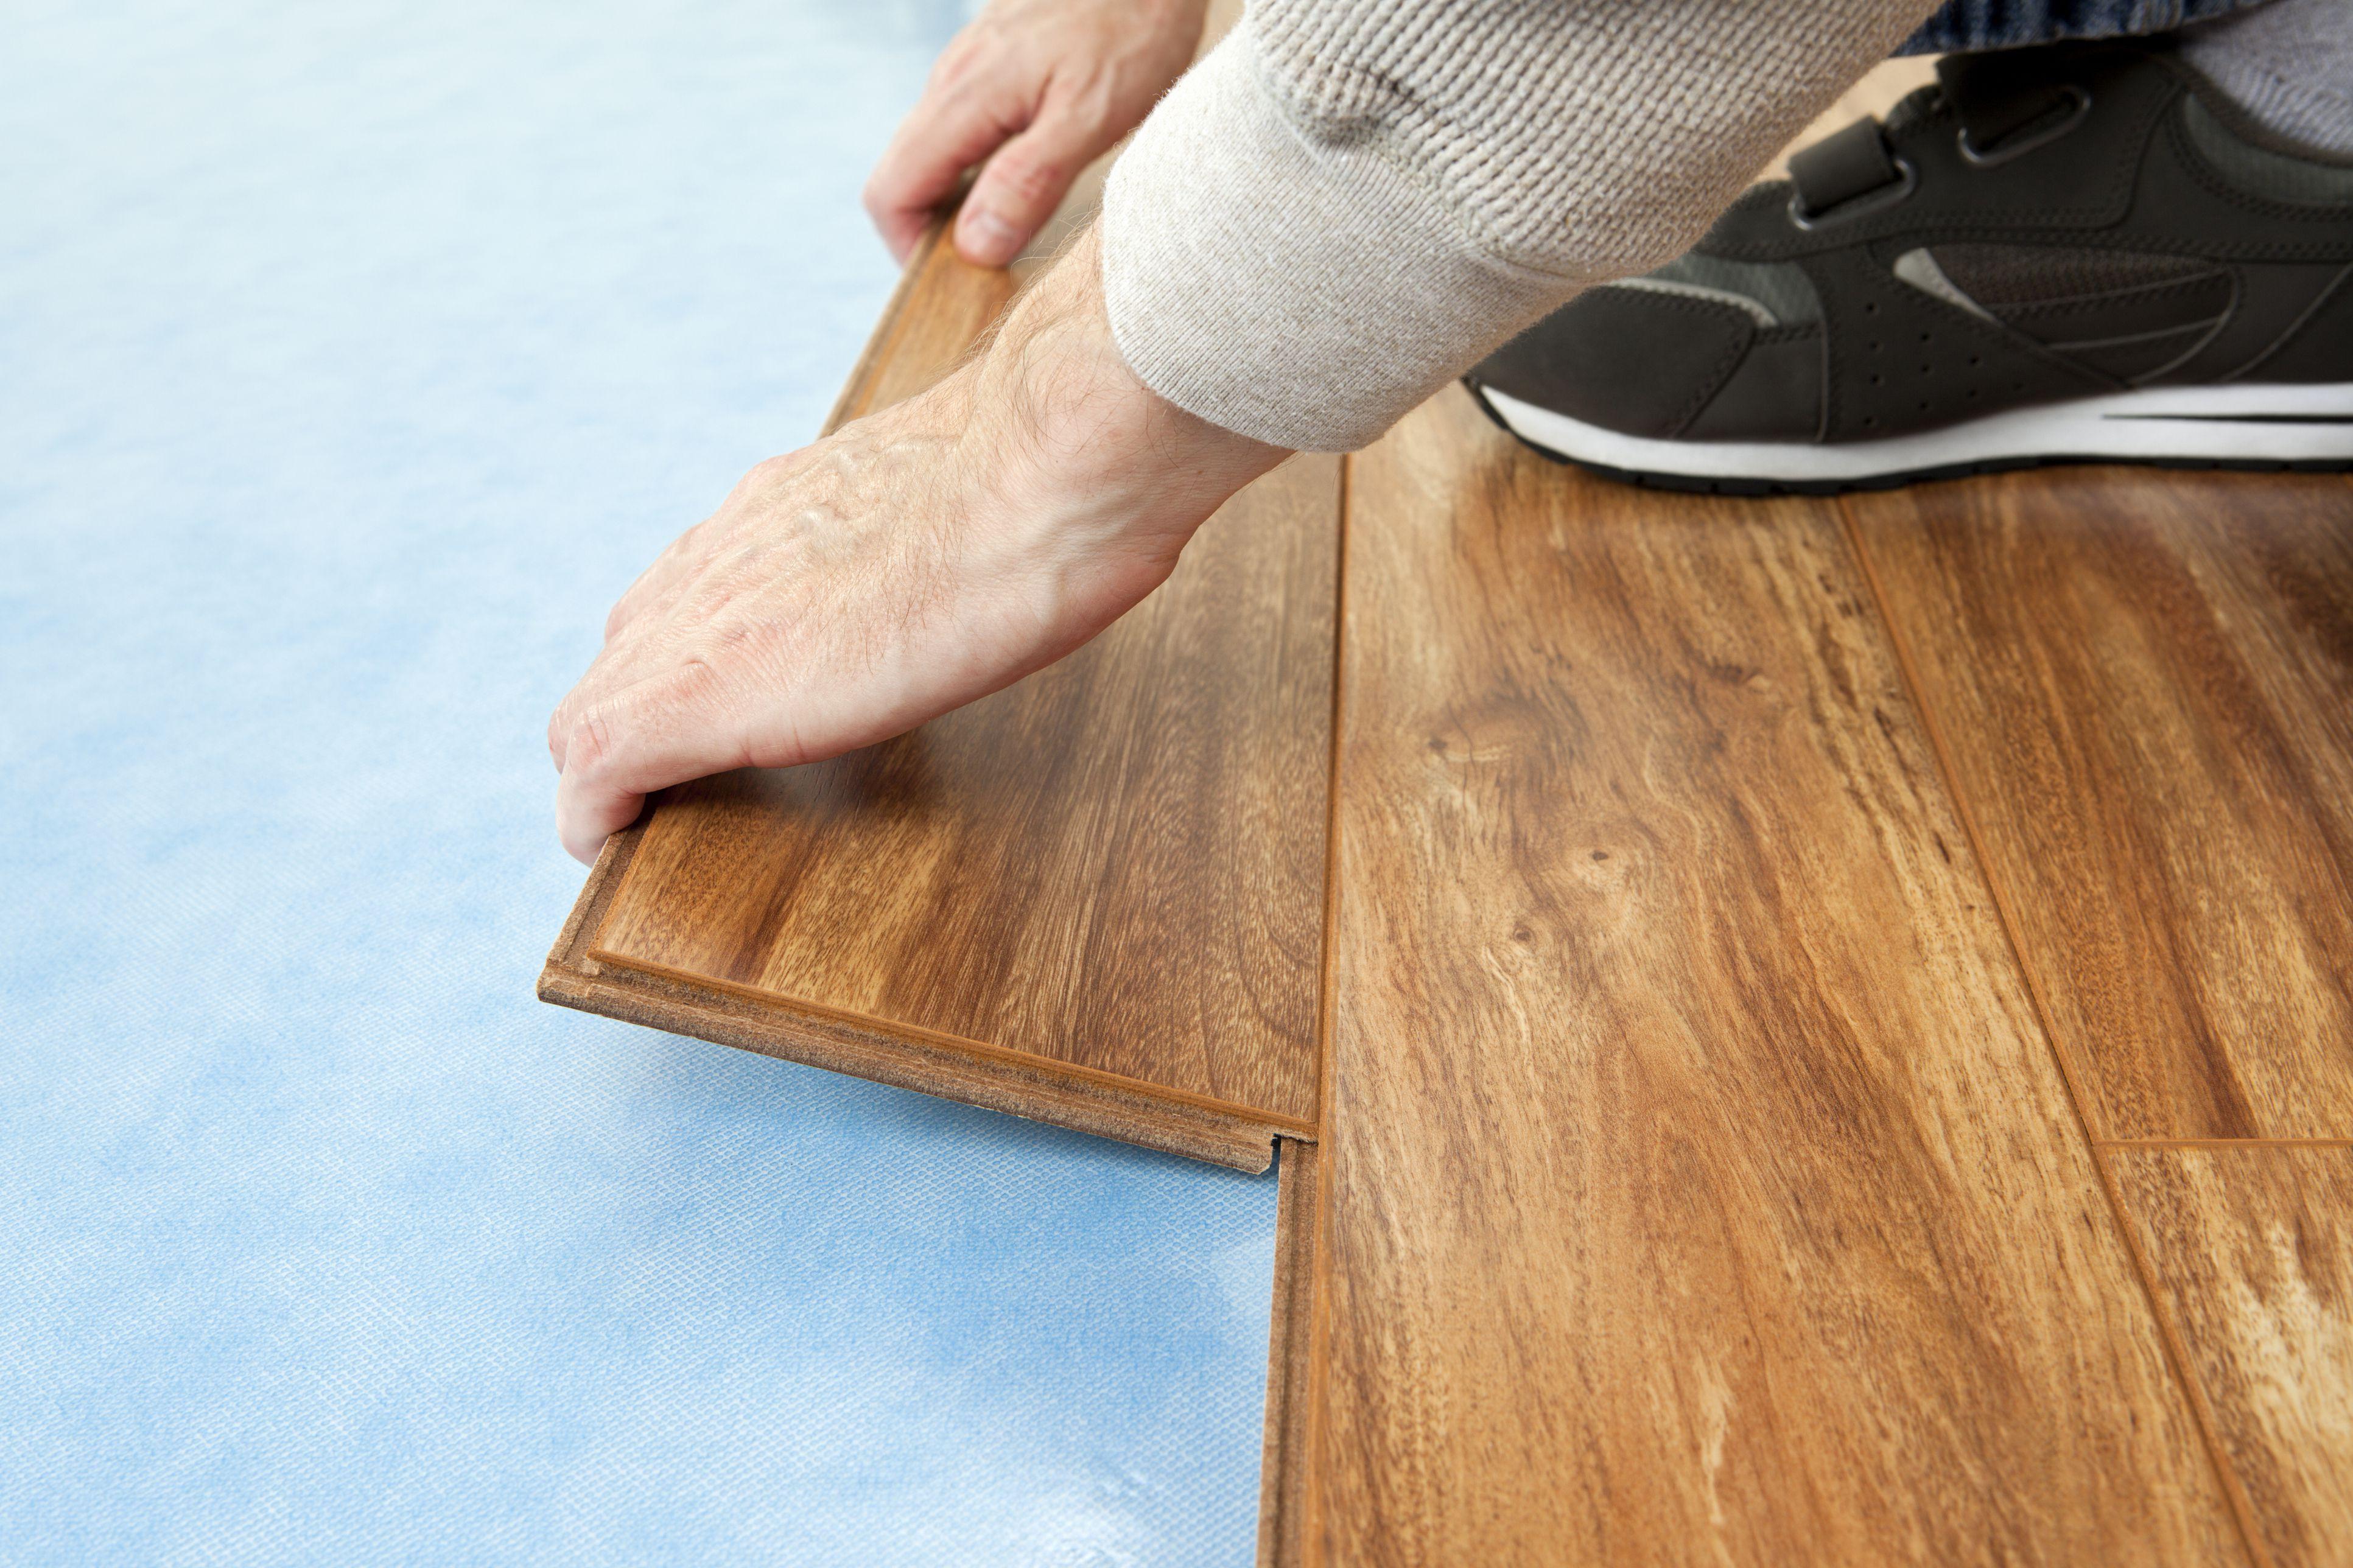 1 2 inch solid hardwood flooring of floor sound barriers that dampen noise between floors regarding installing new floor 155283804 582b79a25f9b58d5b17e597f